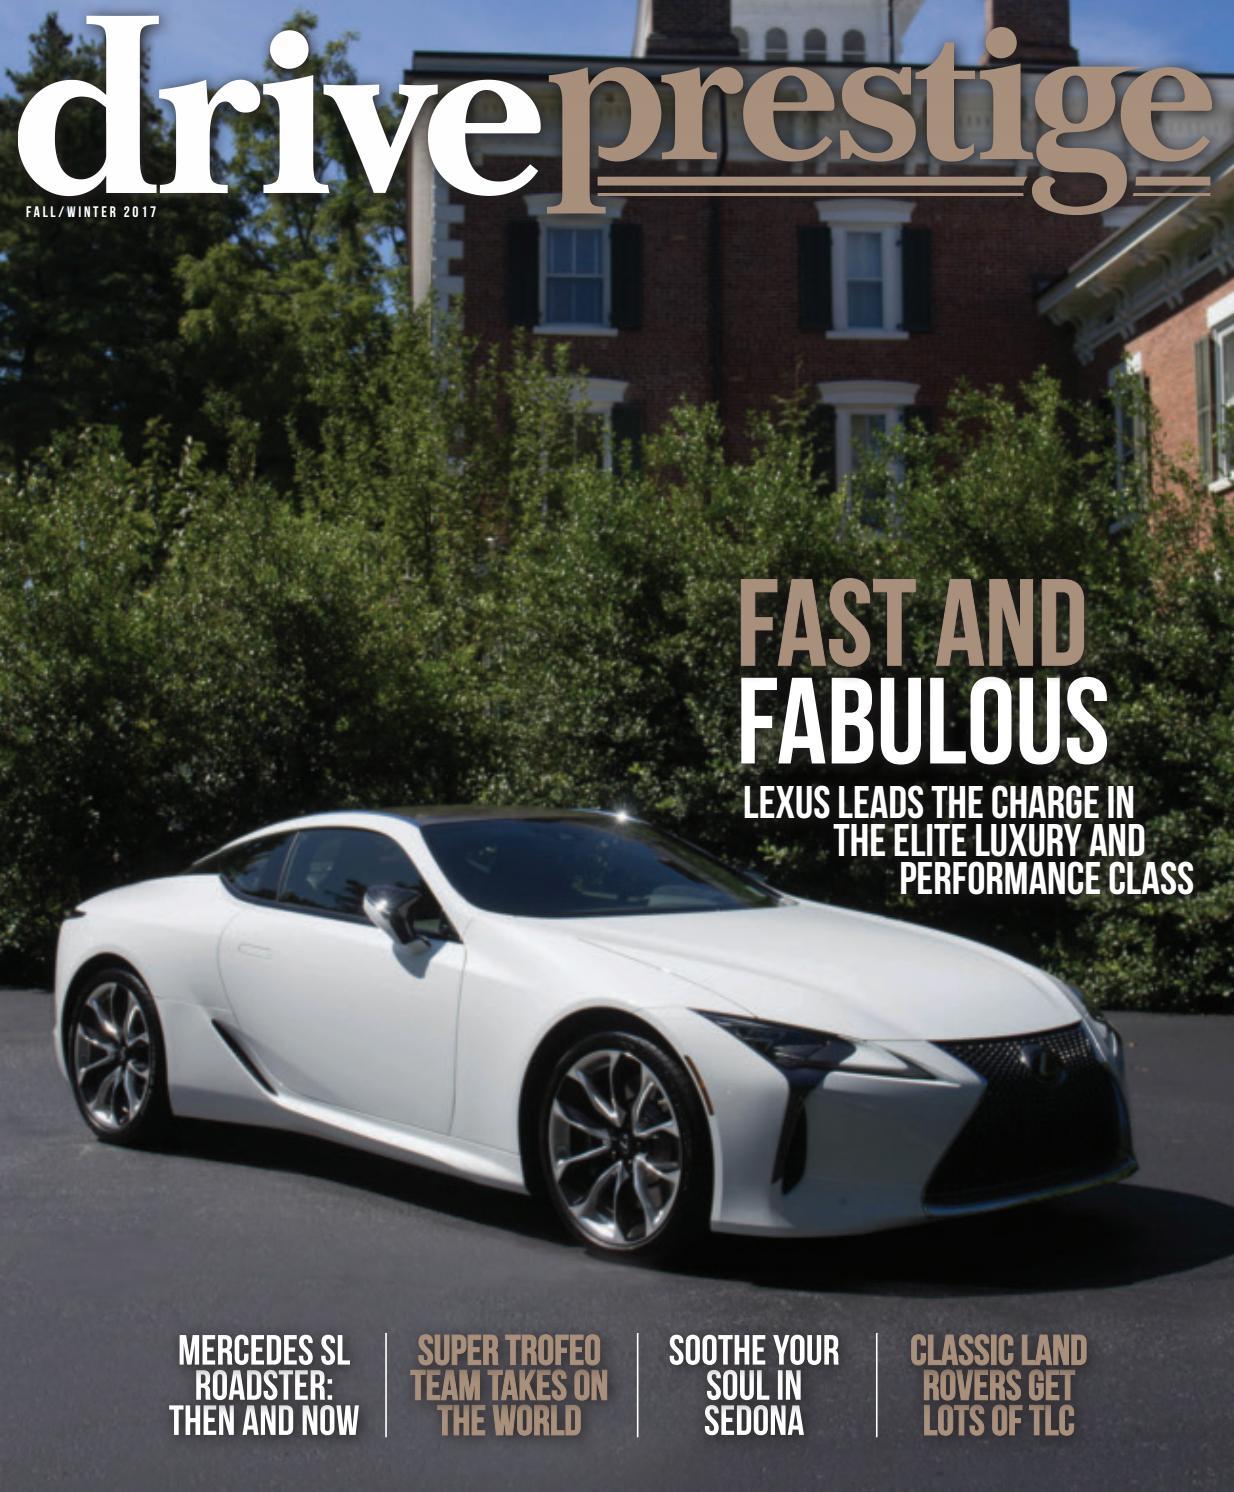 Drive Prestige: Fall/Winter 2017 By Wainscot Media